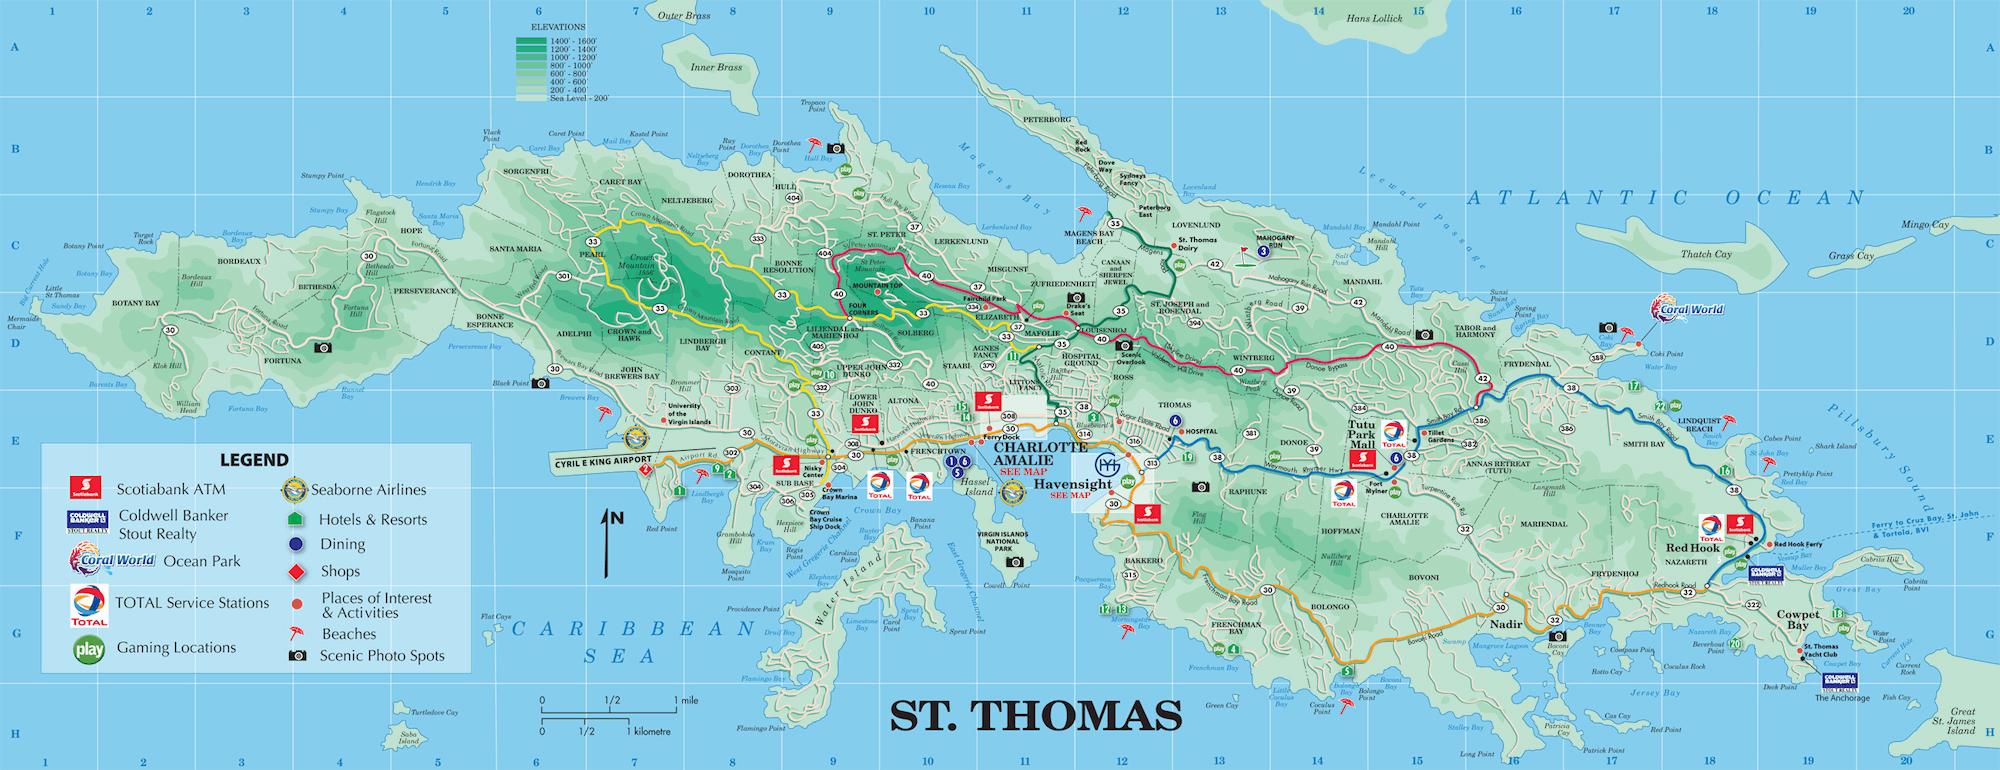 St Thomas Map St. Thomas island tourist map St Thomas Map